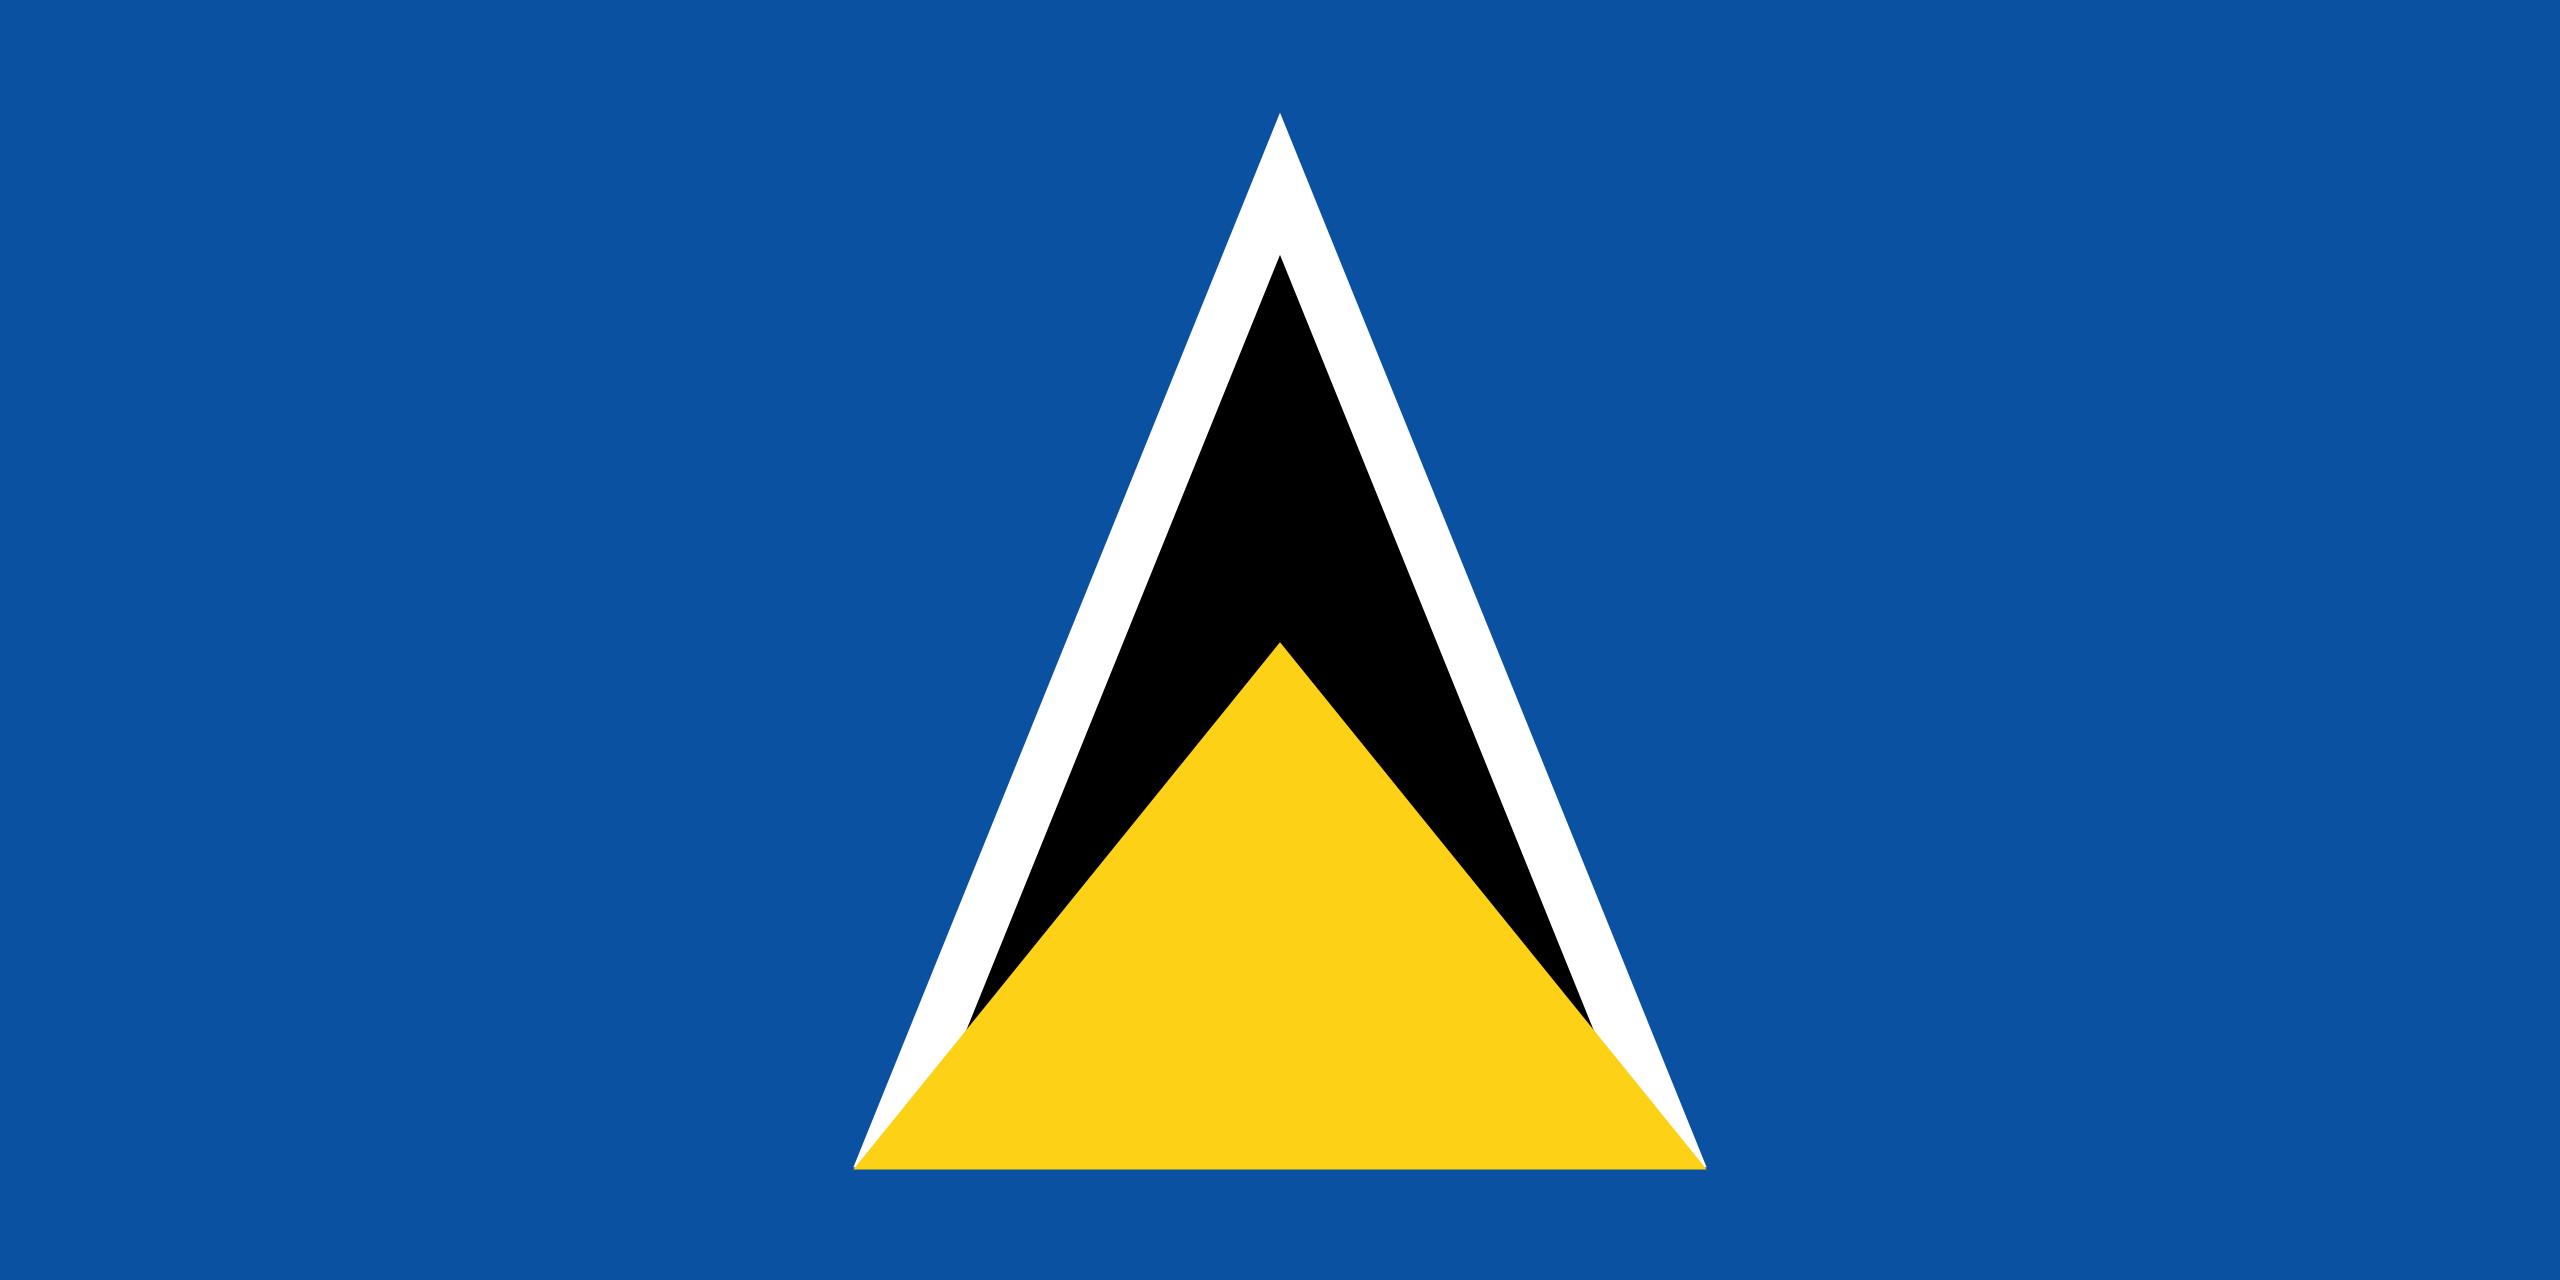 santa lucia, país, emblema, insignia, प्रतीक - HD वॉलपेपर - प्रोफेसर-falken.com